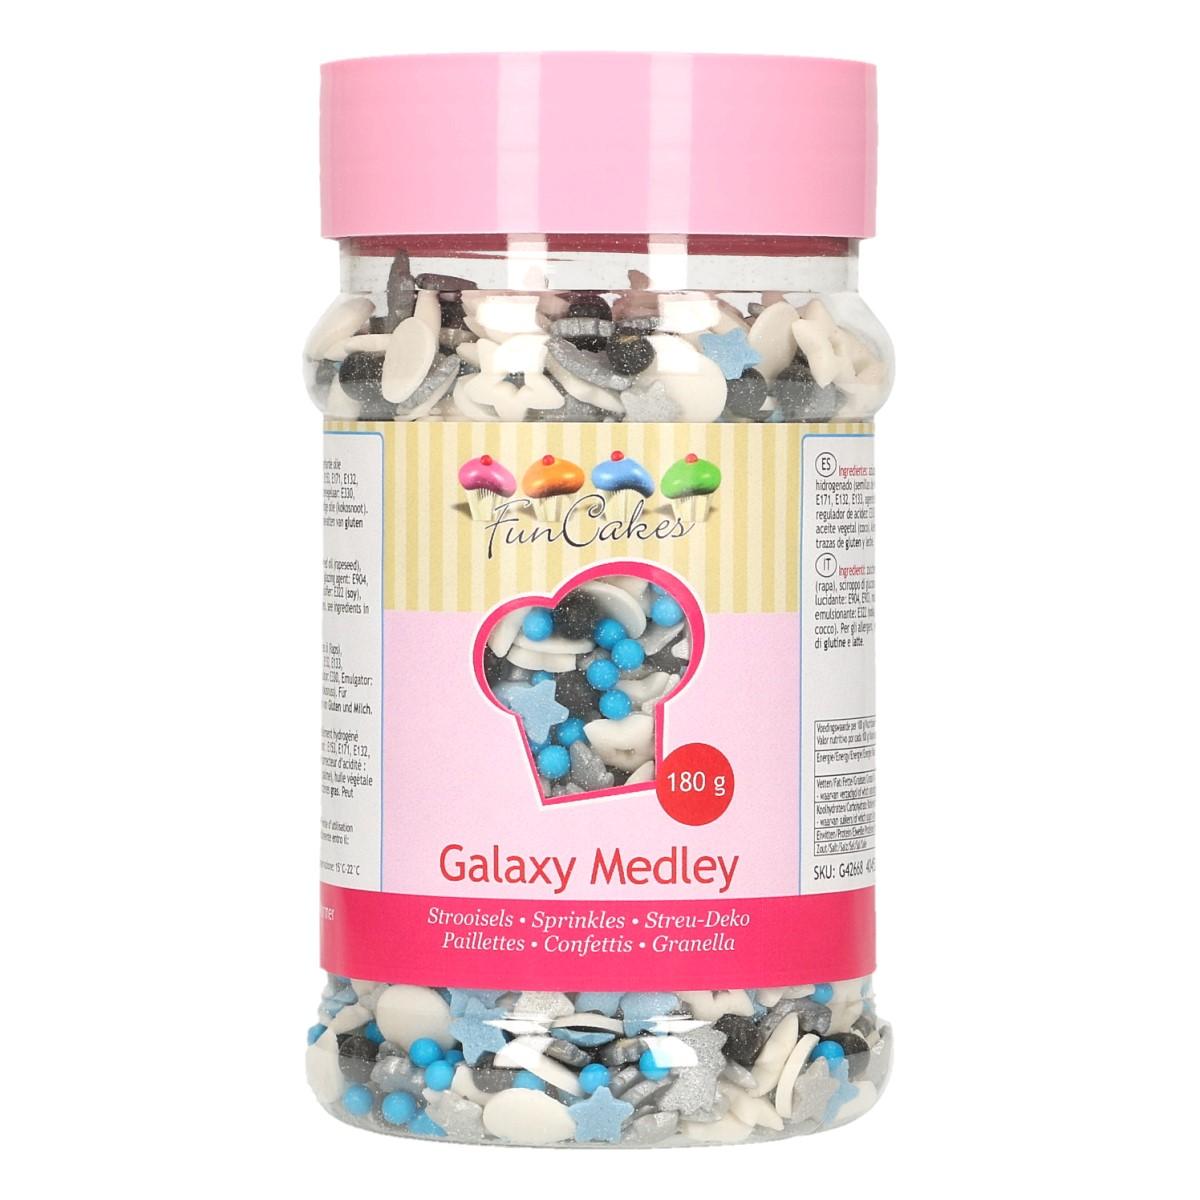 Confetis Açúcar Mistura Galáxia